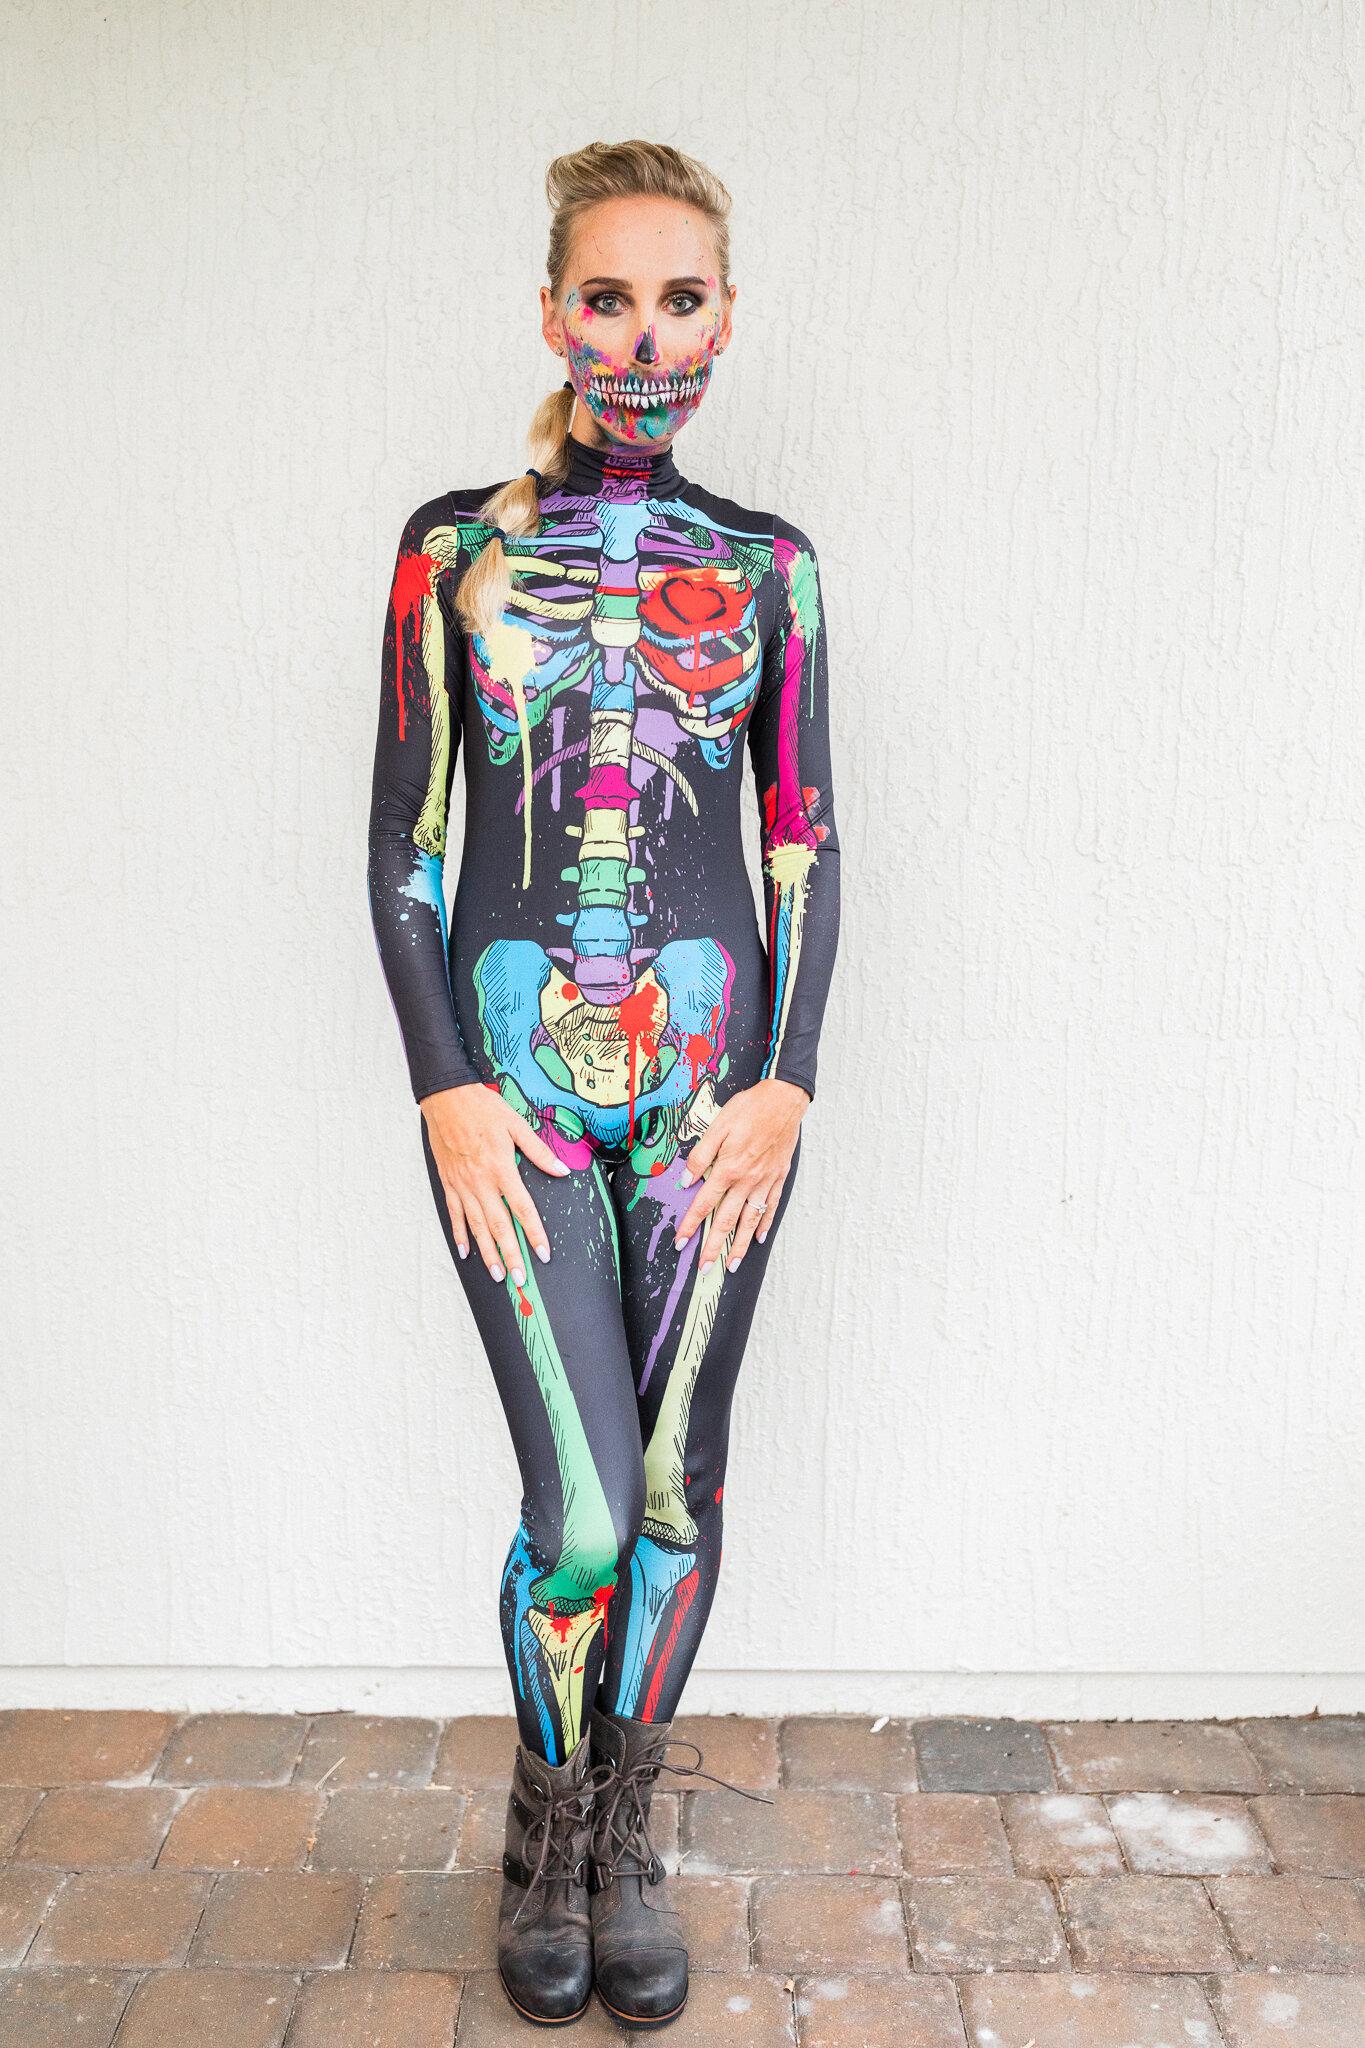 cheap high quyality easy amazon.com skeleton costume and amazing makeup ideas